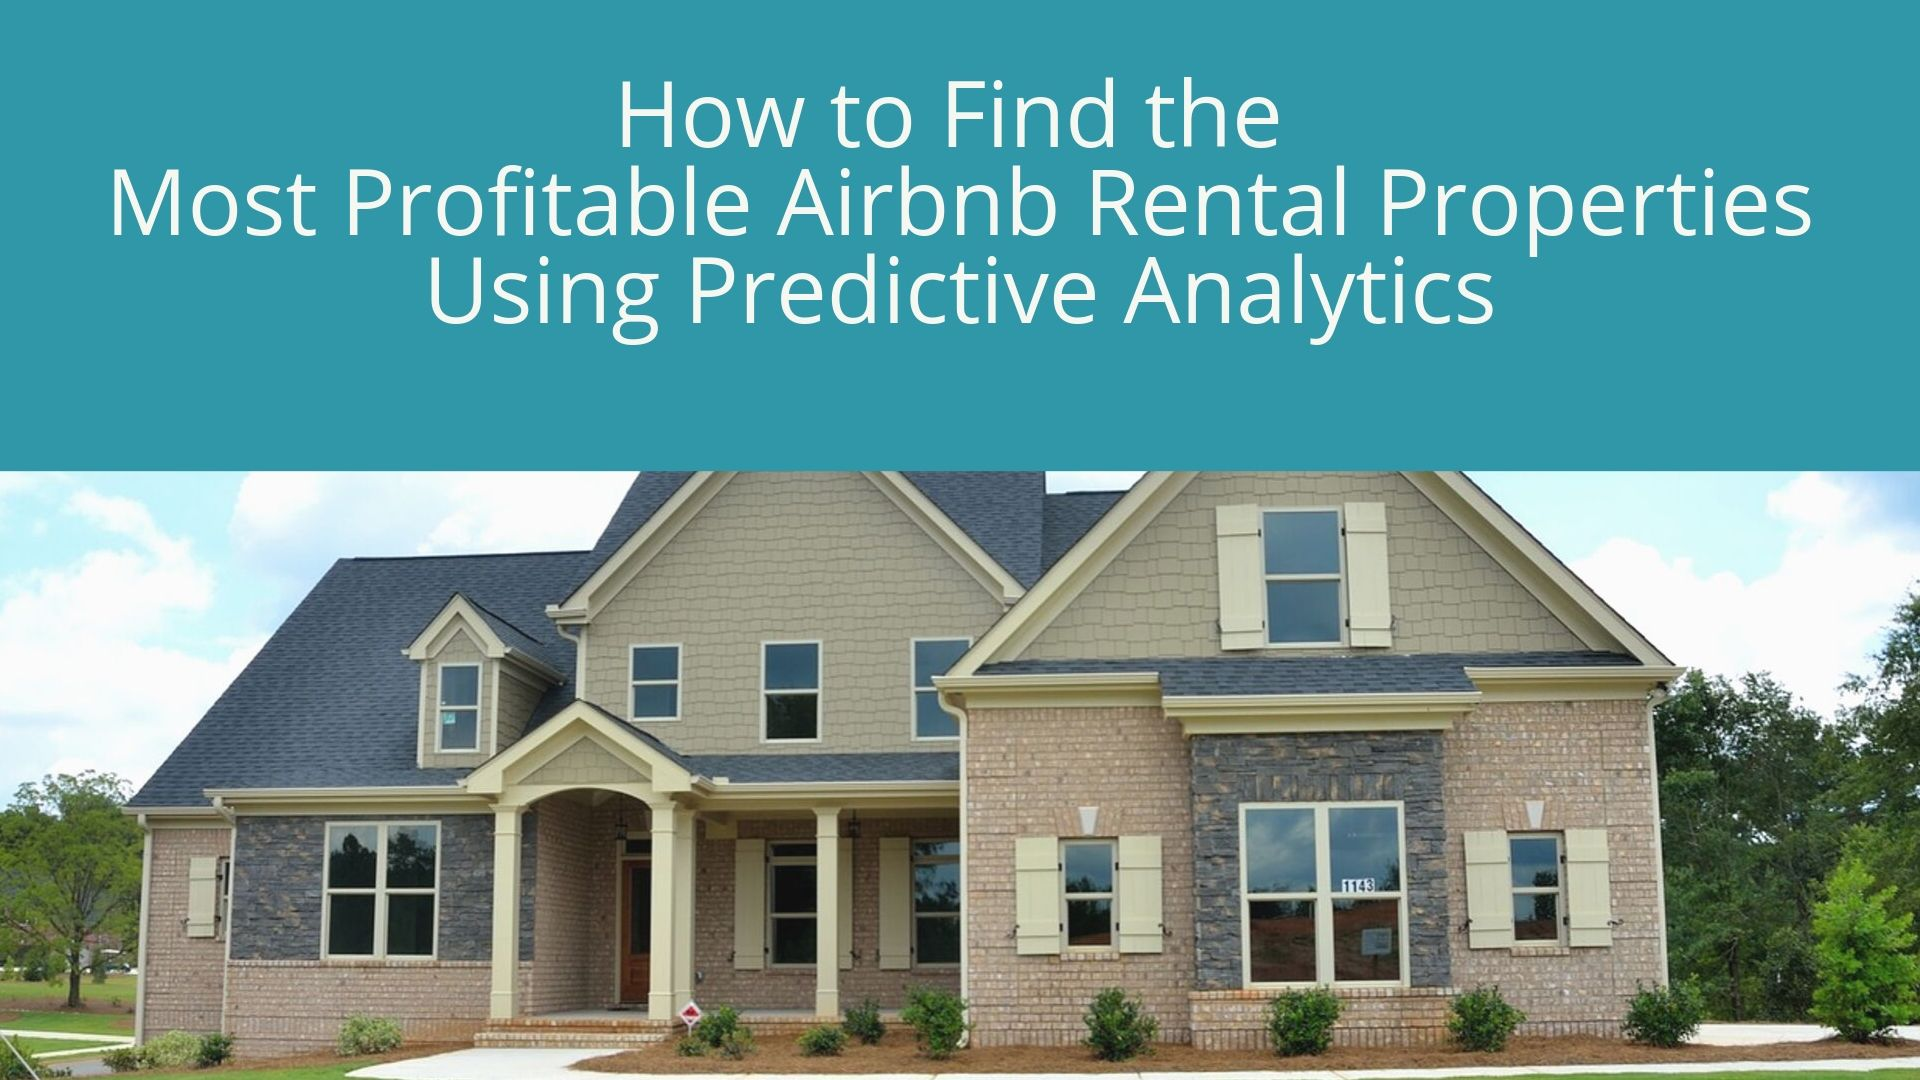 Find profitable Airbnb rentals